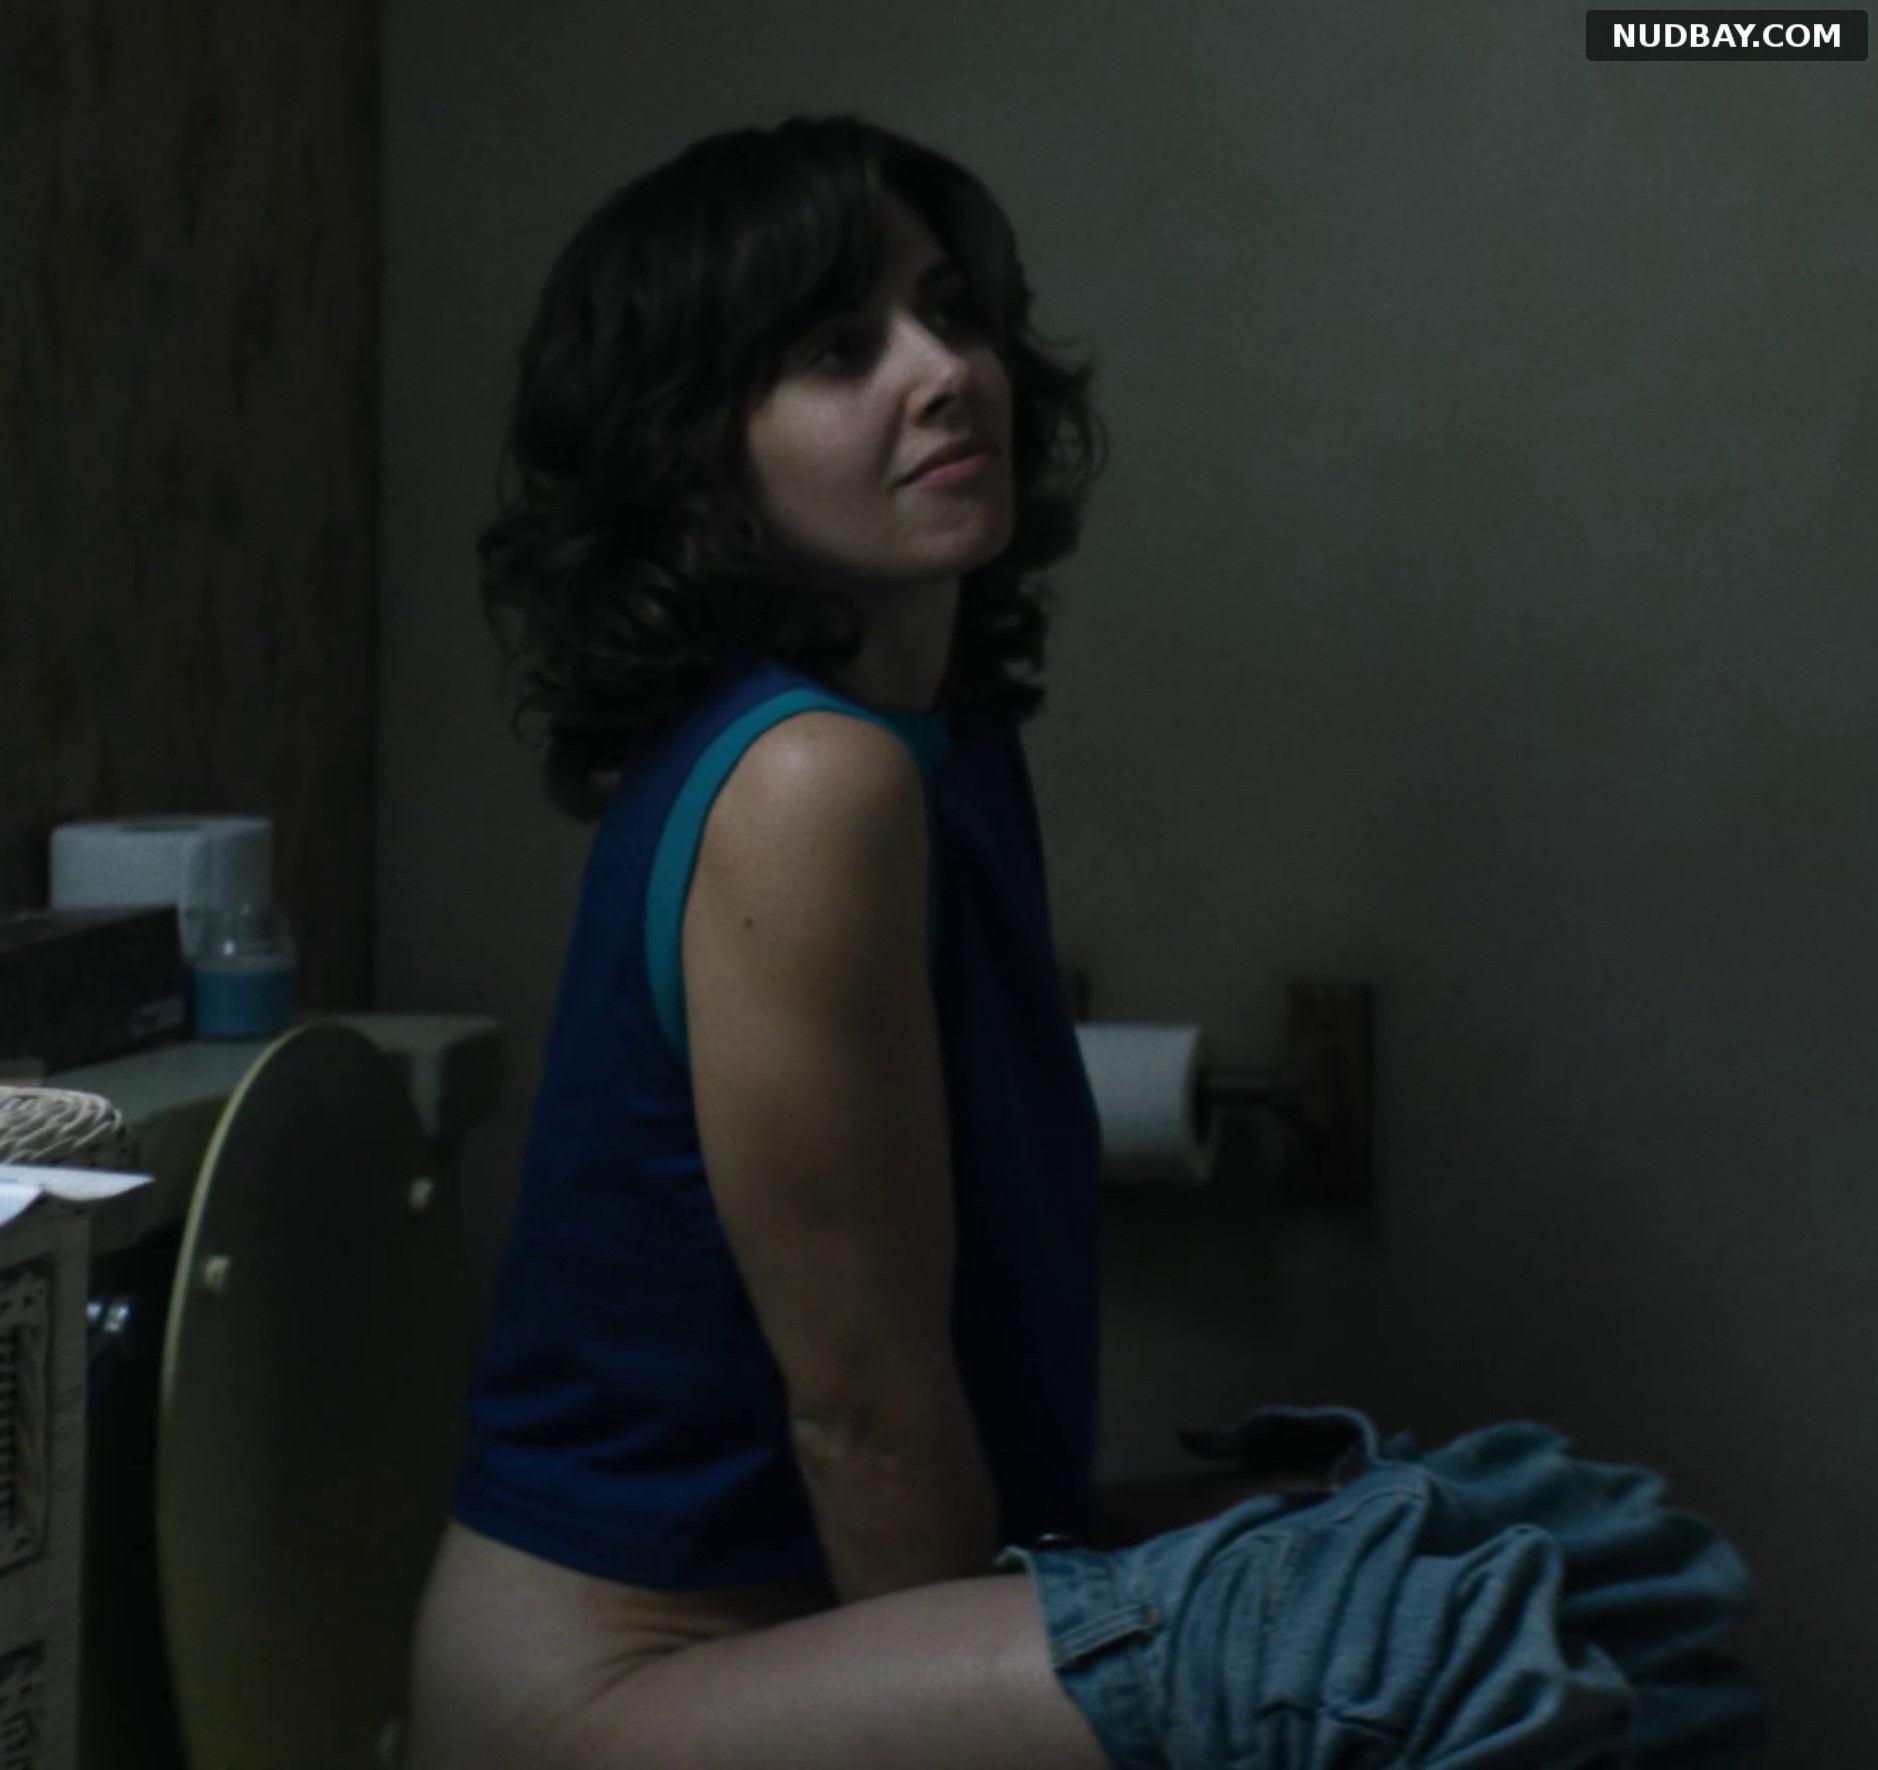 Alison Brie nude in TV series Glow (2017)